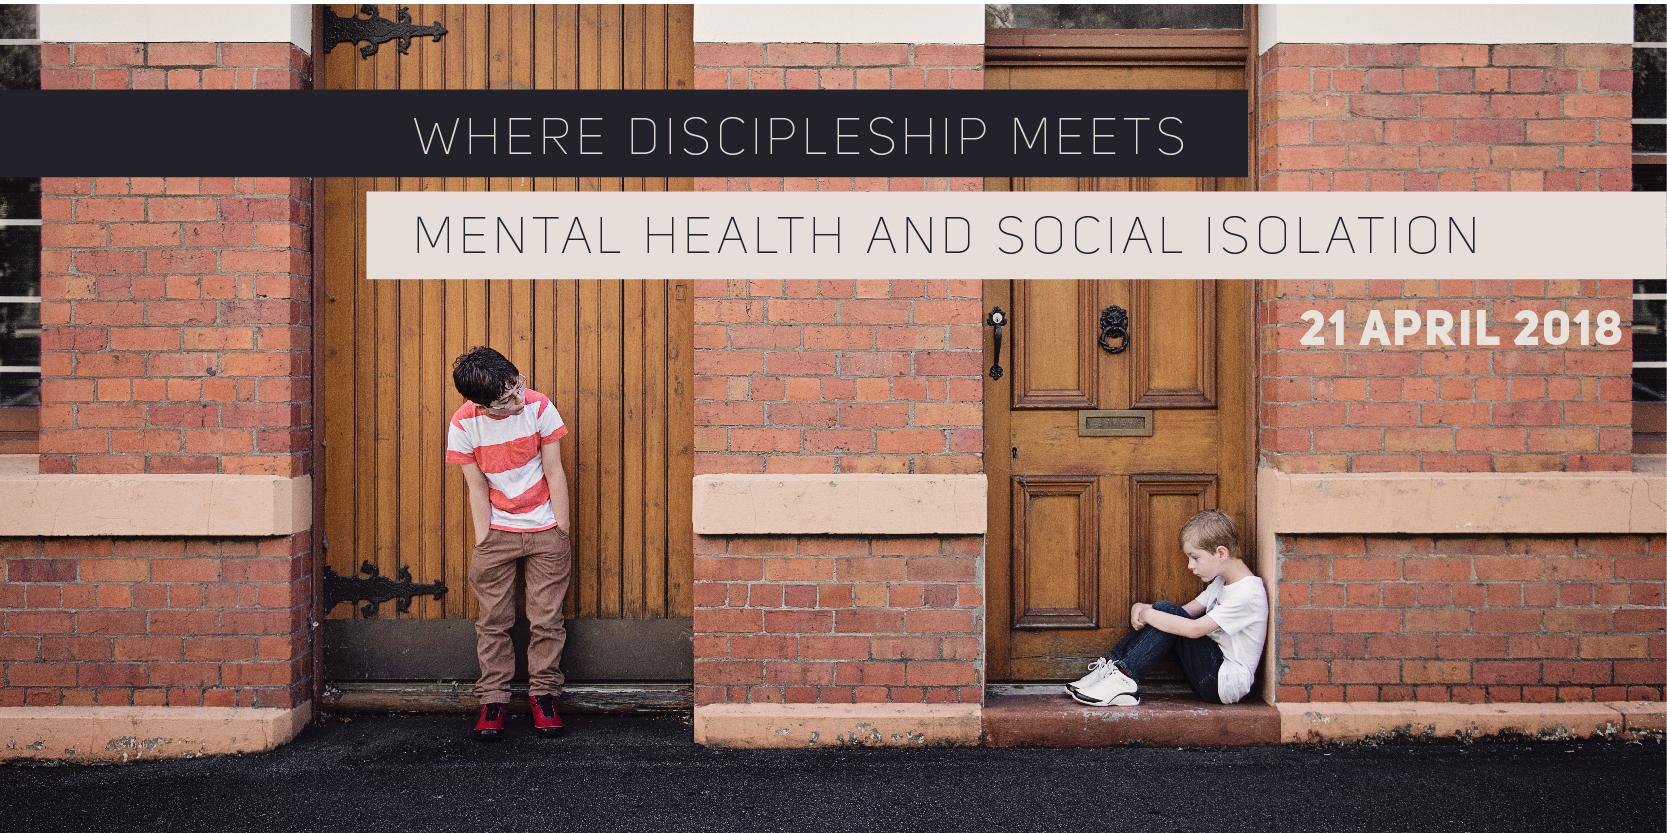 Discipleship-Mental_Health-02.jpg